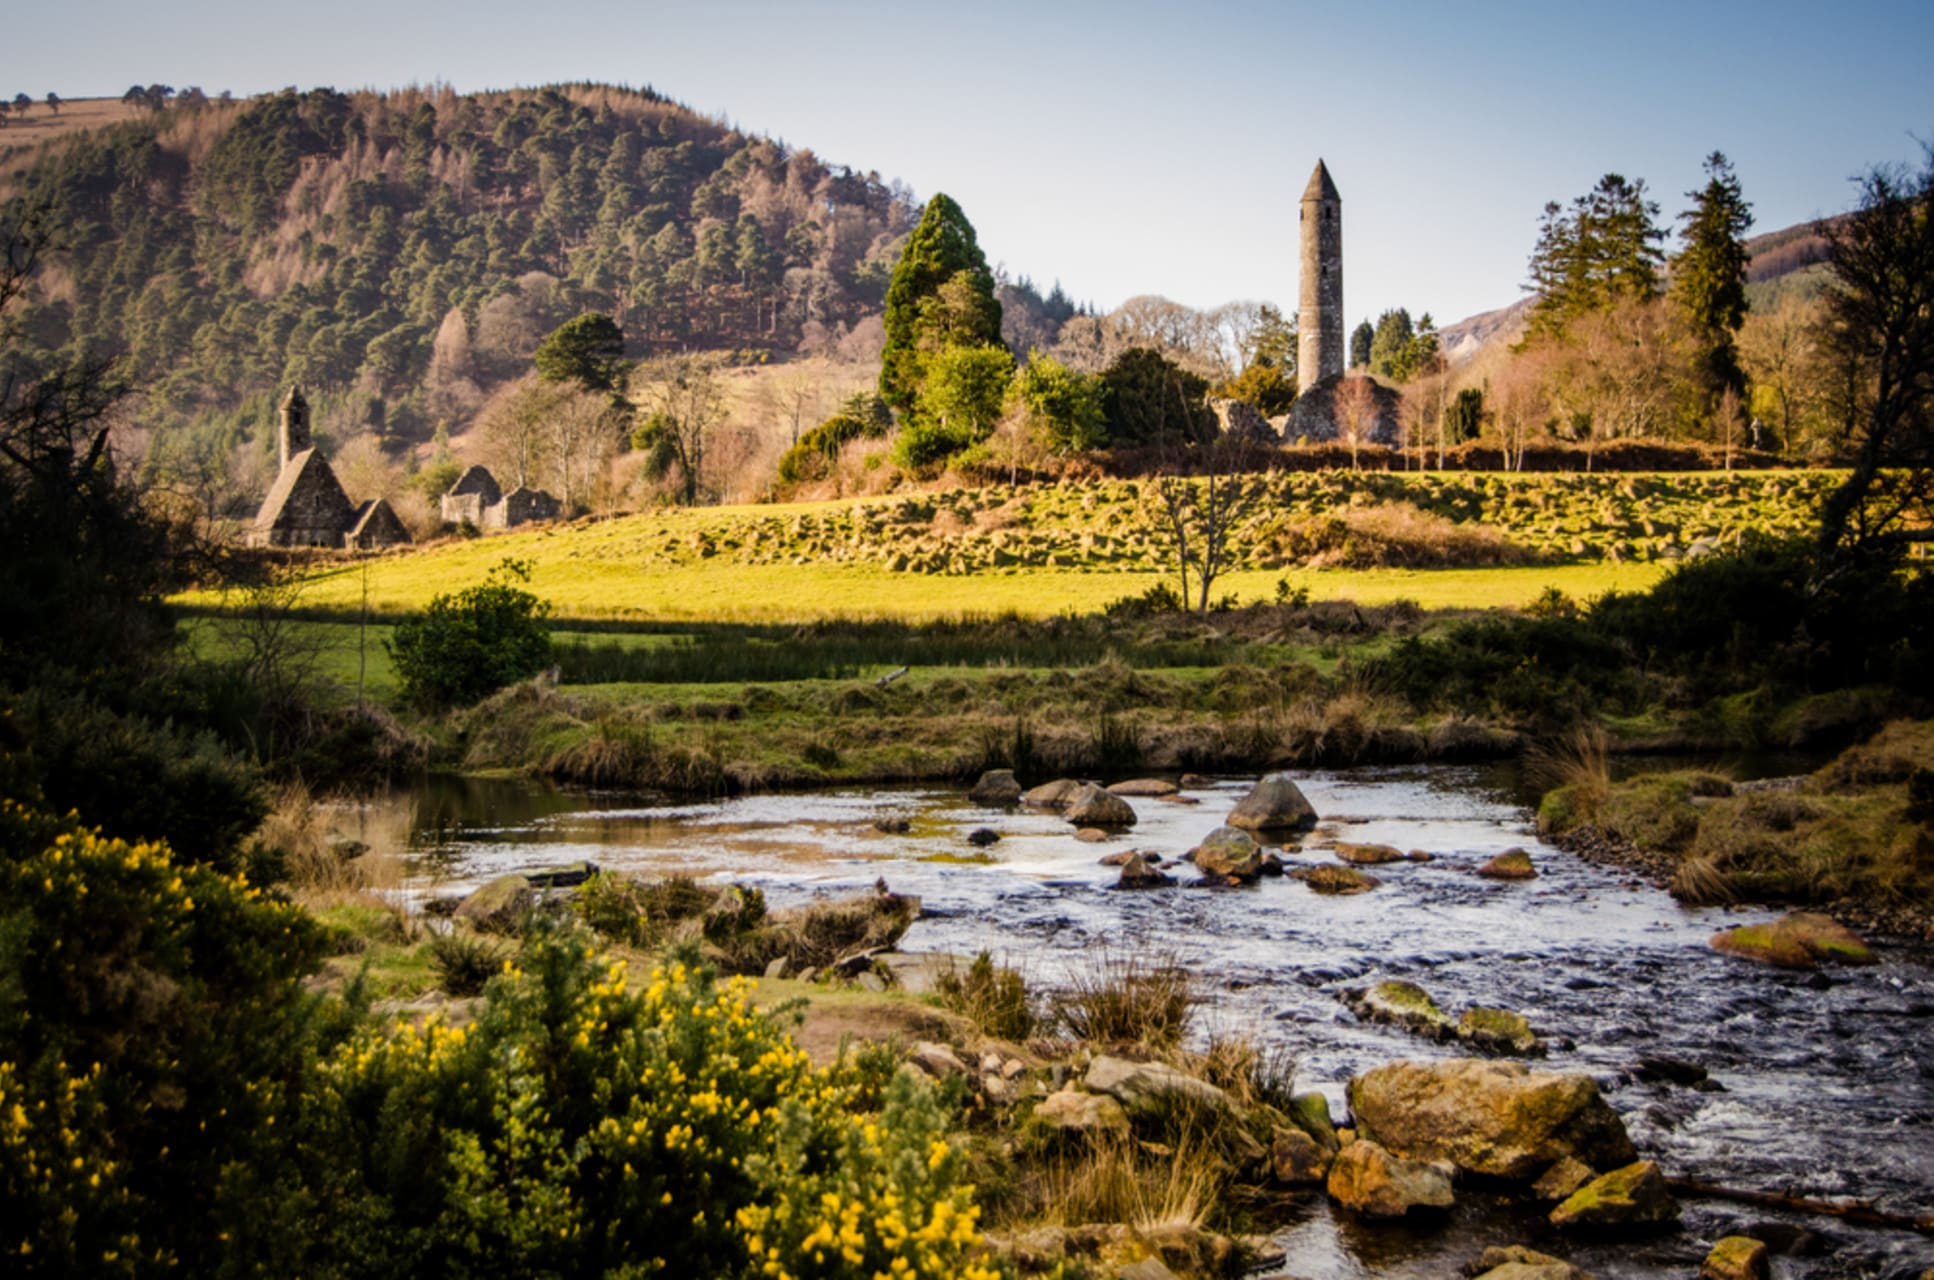 Wicklow - Glendalough's Mystical Monastic City